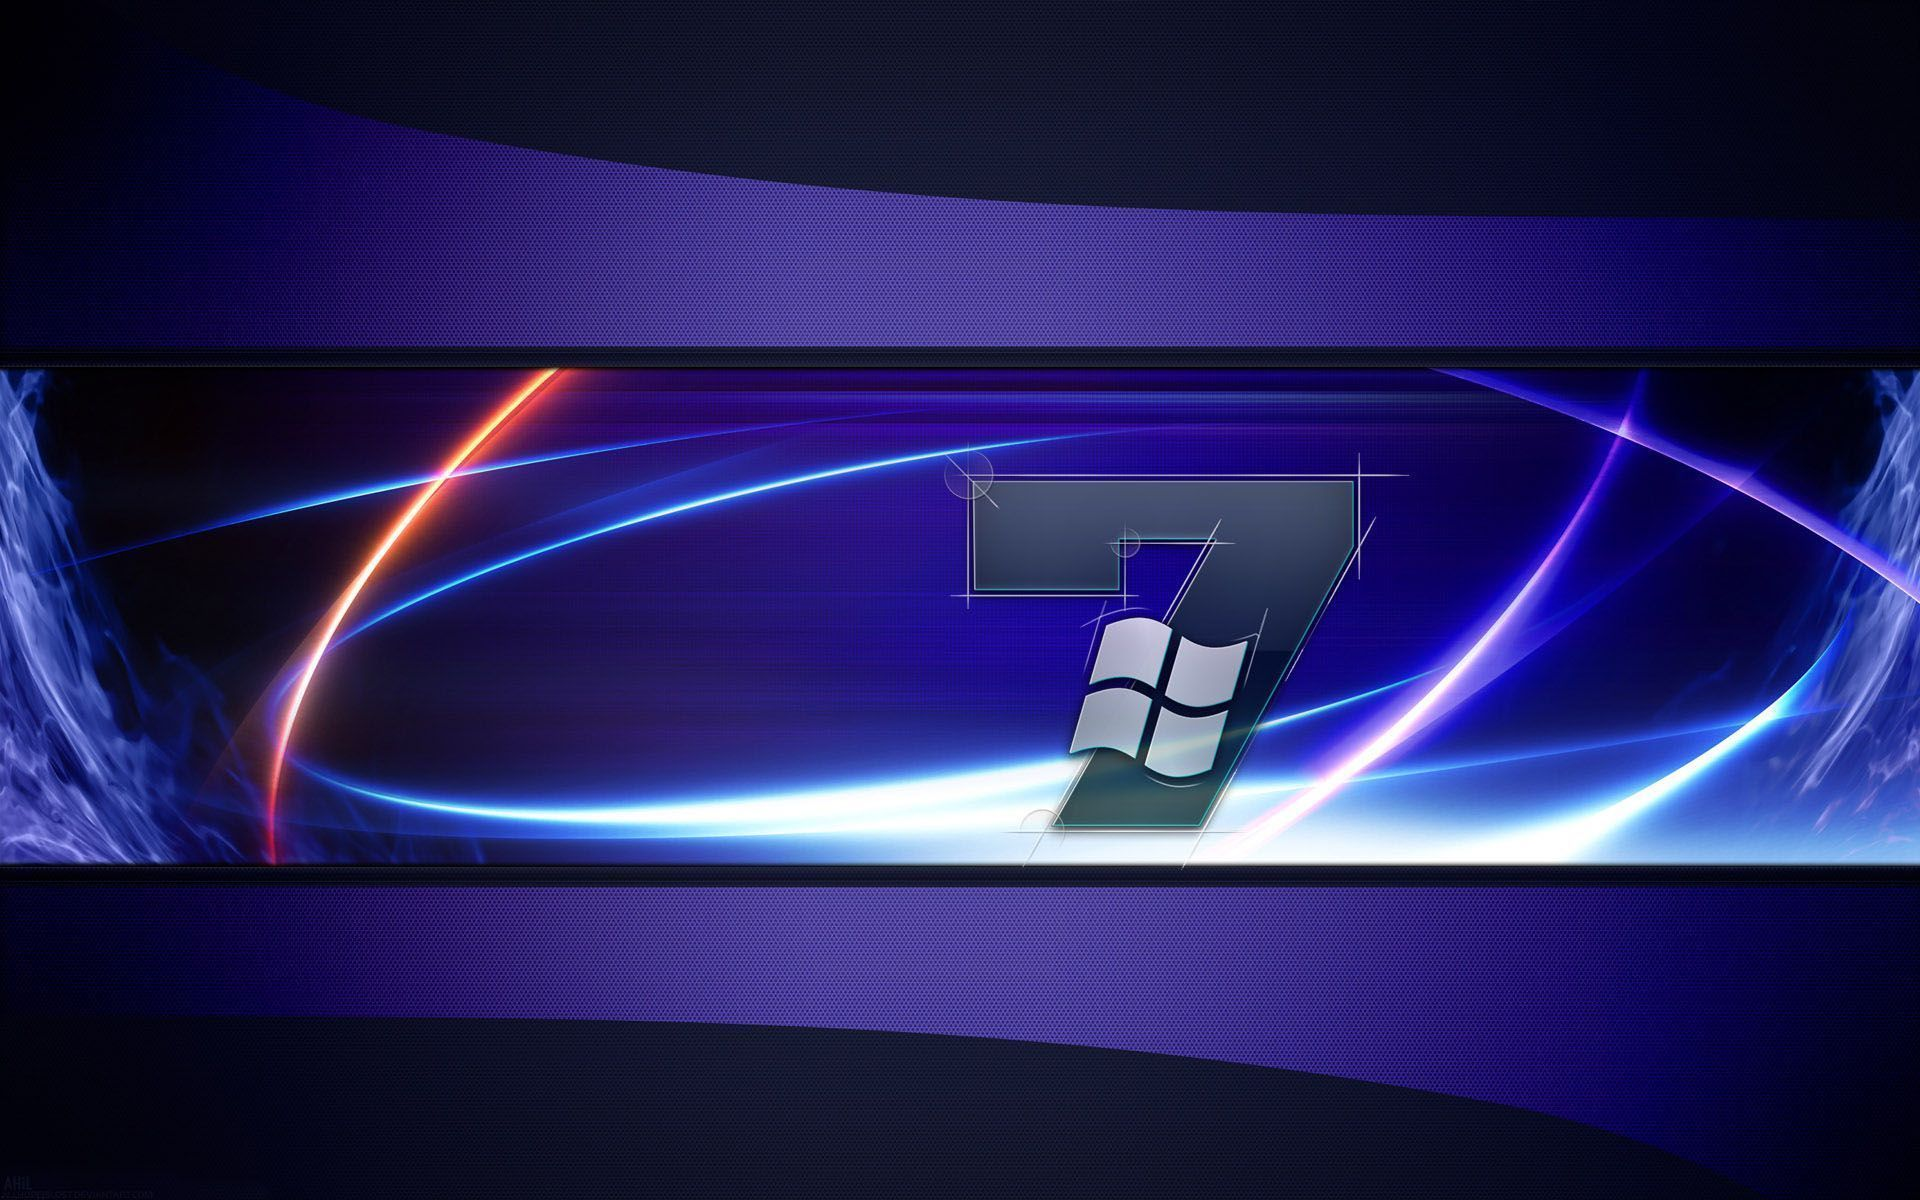 Windows 7 Ultimate Wallpaper Widescreen 4 Press Magazine Desktop Wallpapers Backgrounds Wallpaper Hd Wallpaper